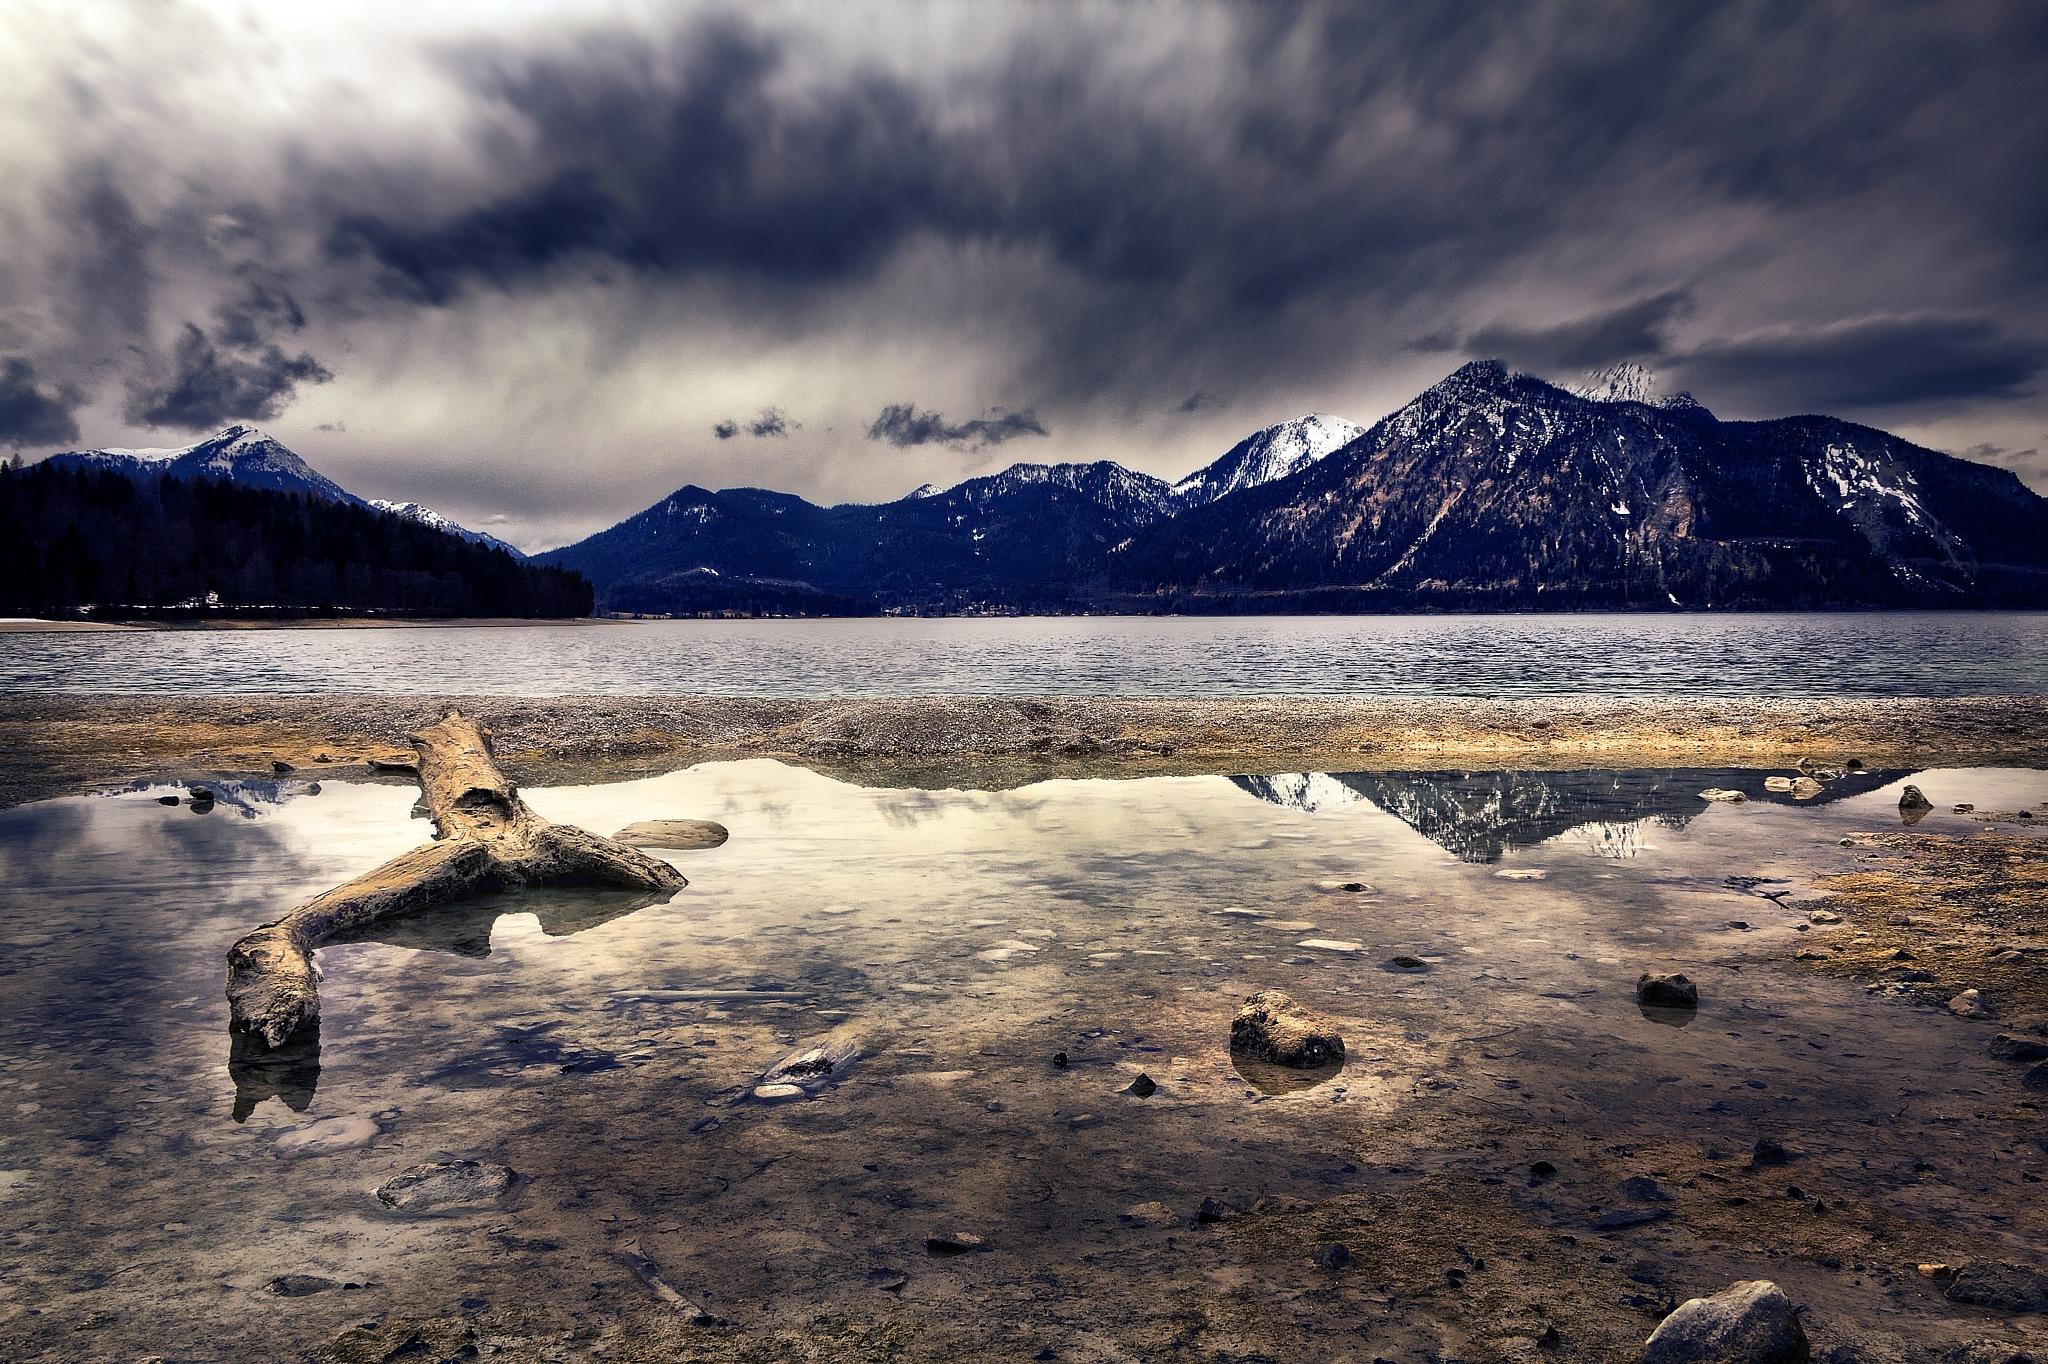 Walchensee by Michael Stapfer